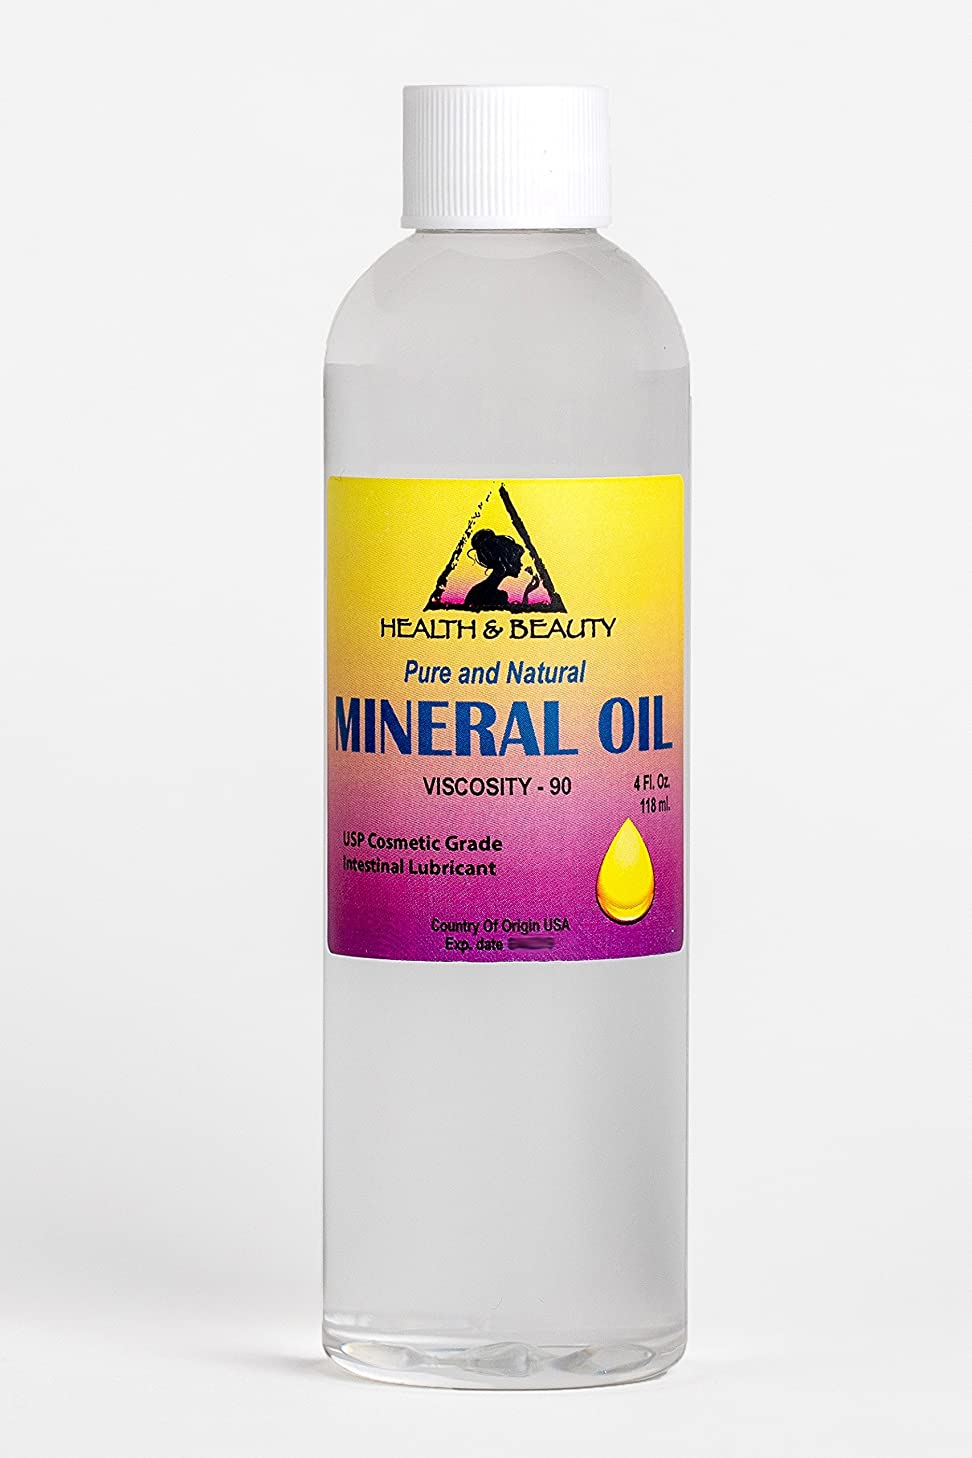 Mineral Oil 90 Viscosity NF USP Grade Intestinal Lubricant 100% Pure 4 oz